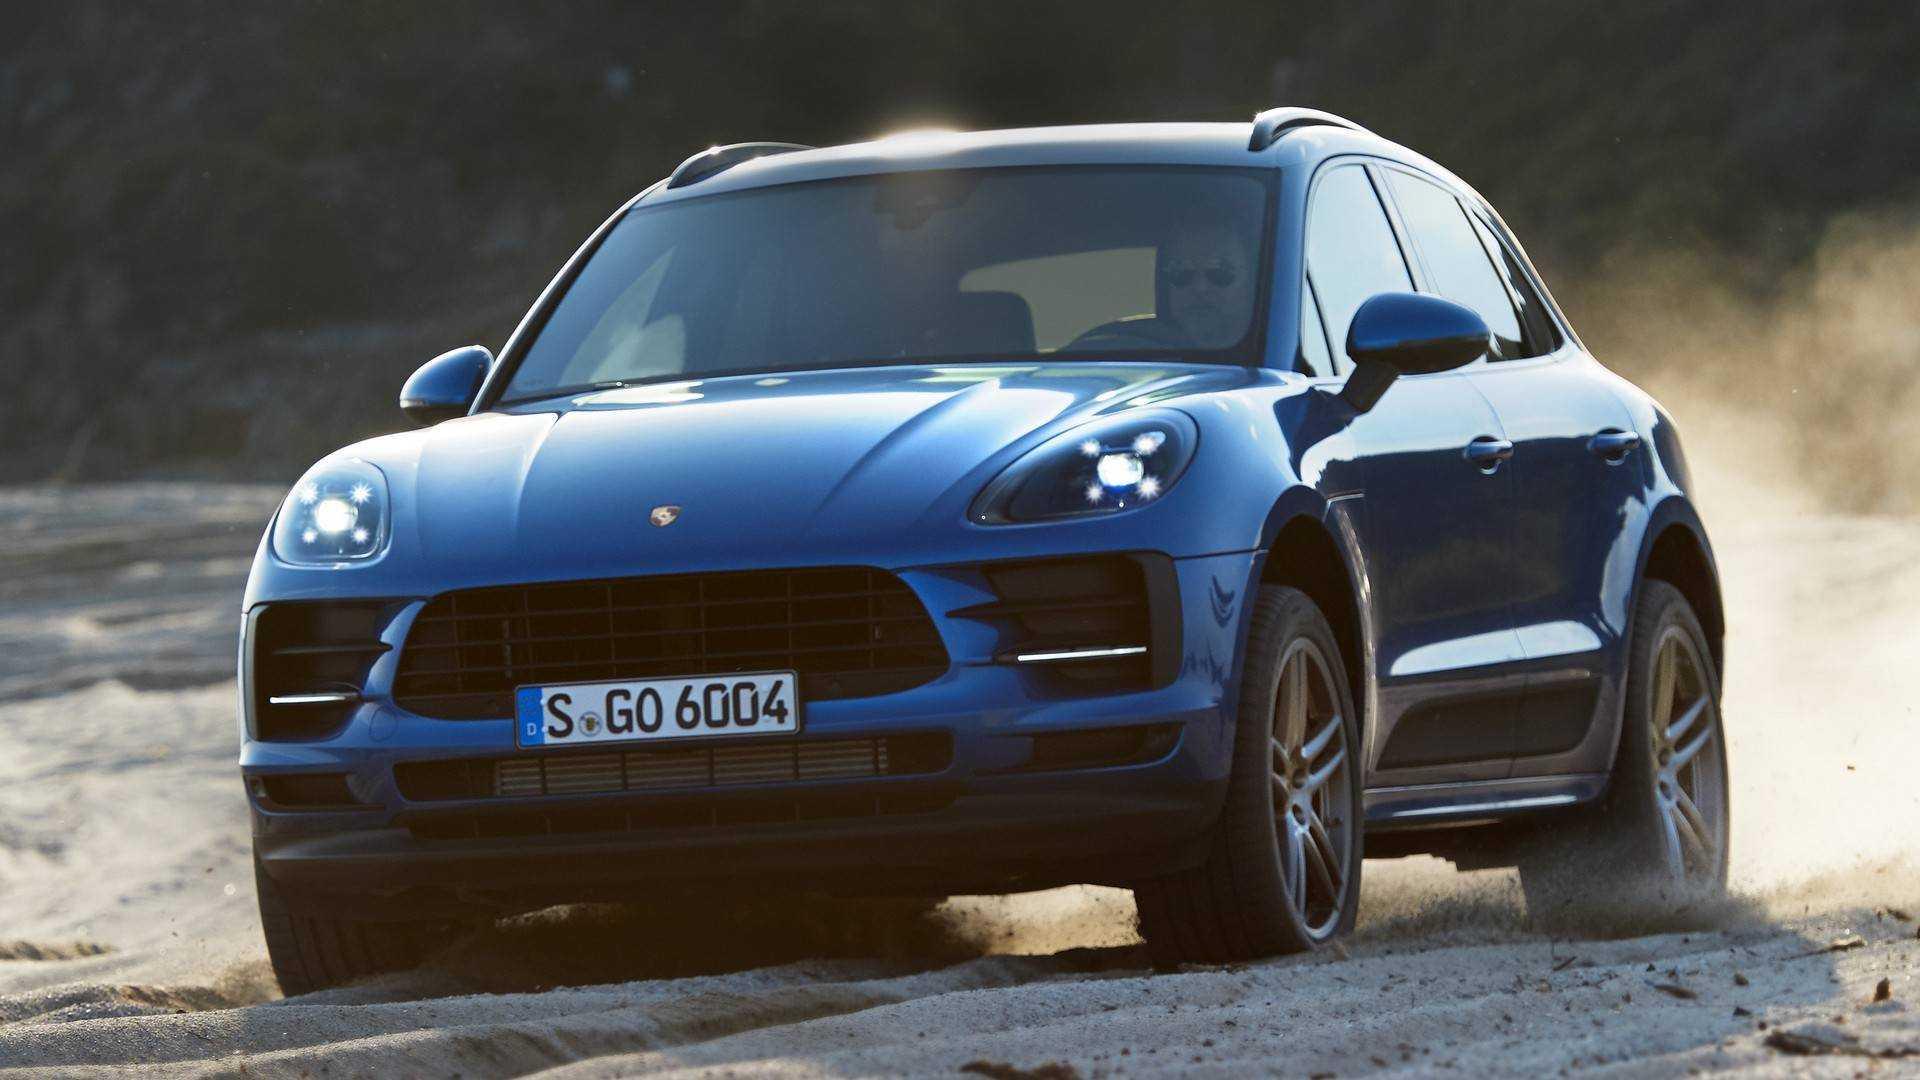 2019 Porsche Macan Starts Under $50K, Arrives Summer 2019